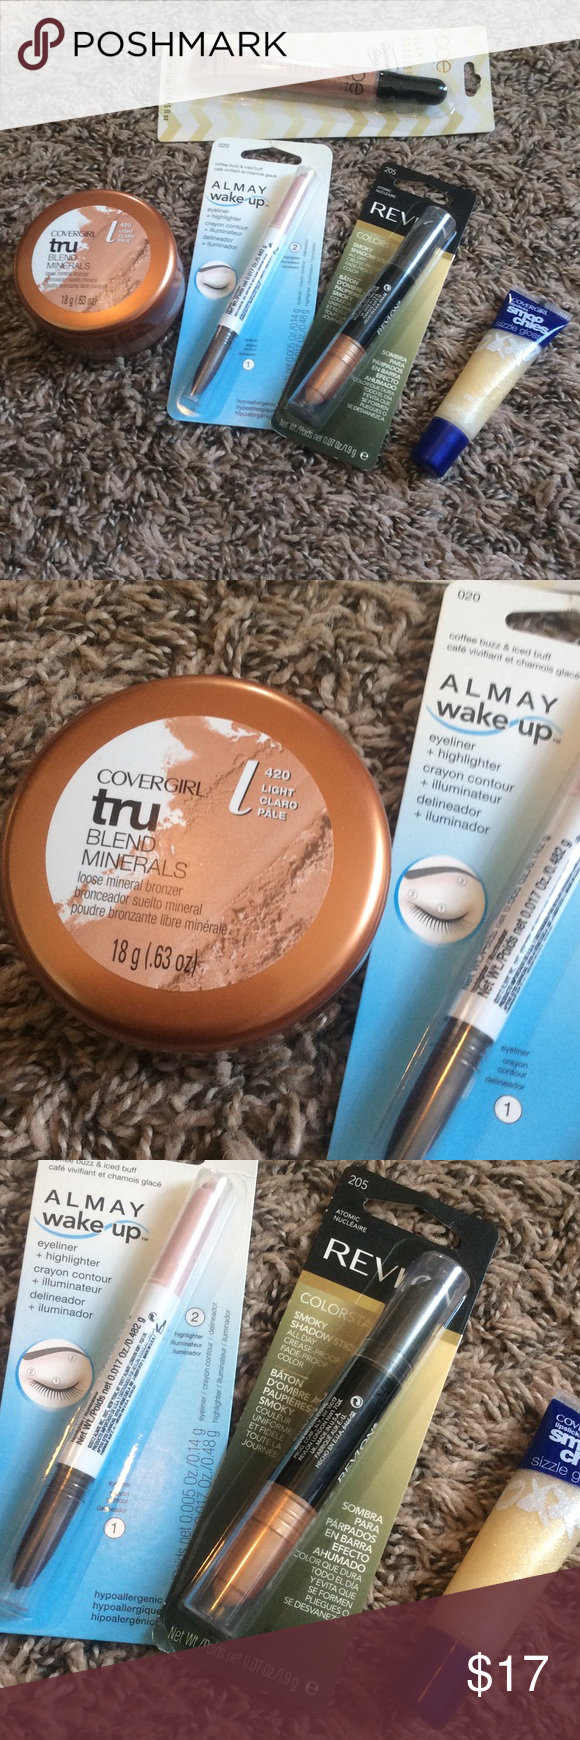 Drugstore makeup bundle💝 Covergirl Tru blend minerals